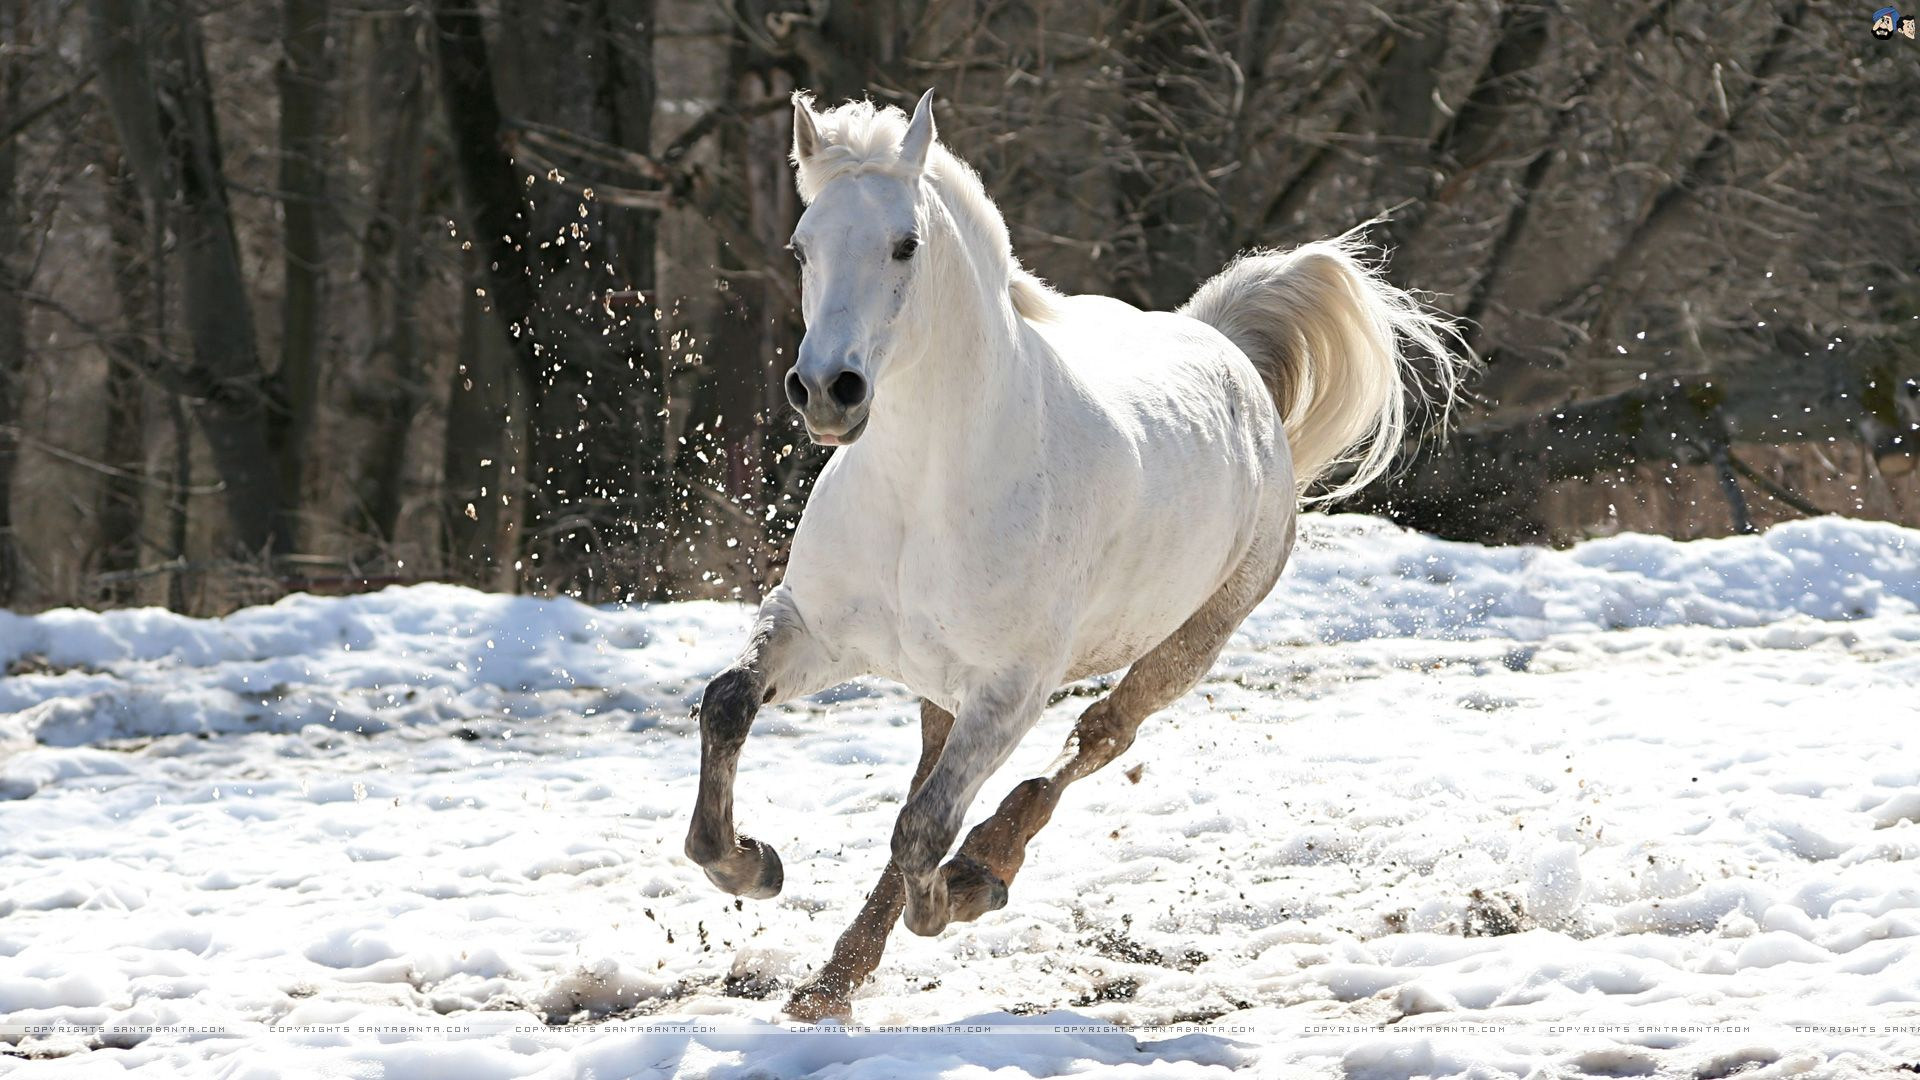 Amazing Wallpaper Horse Snow - 18141d7111ab5c5b0bad403fe3847758  Collection_59871.jpg